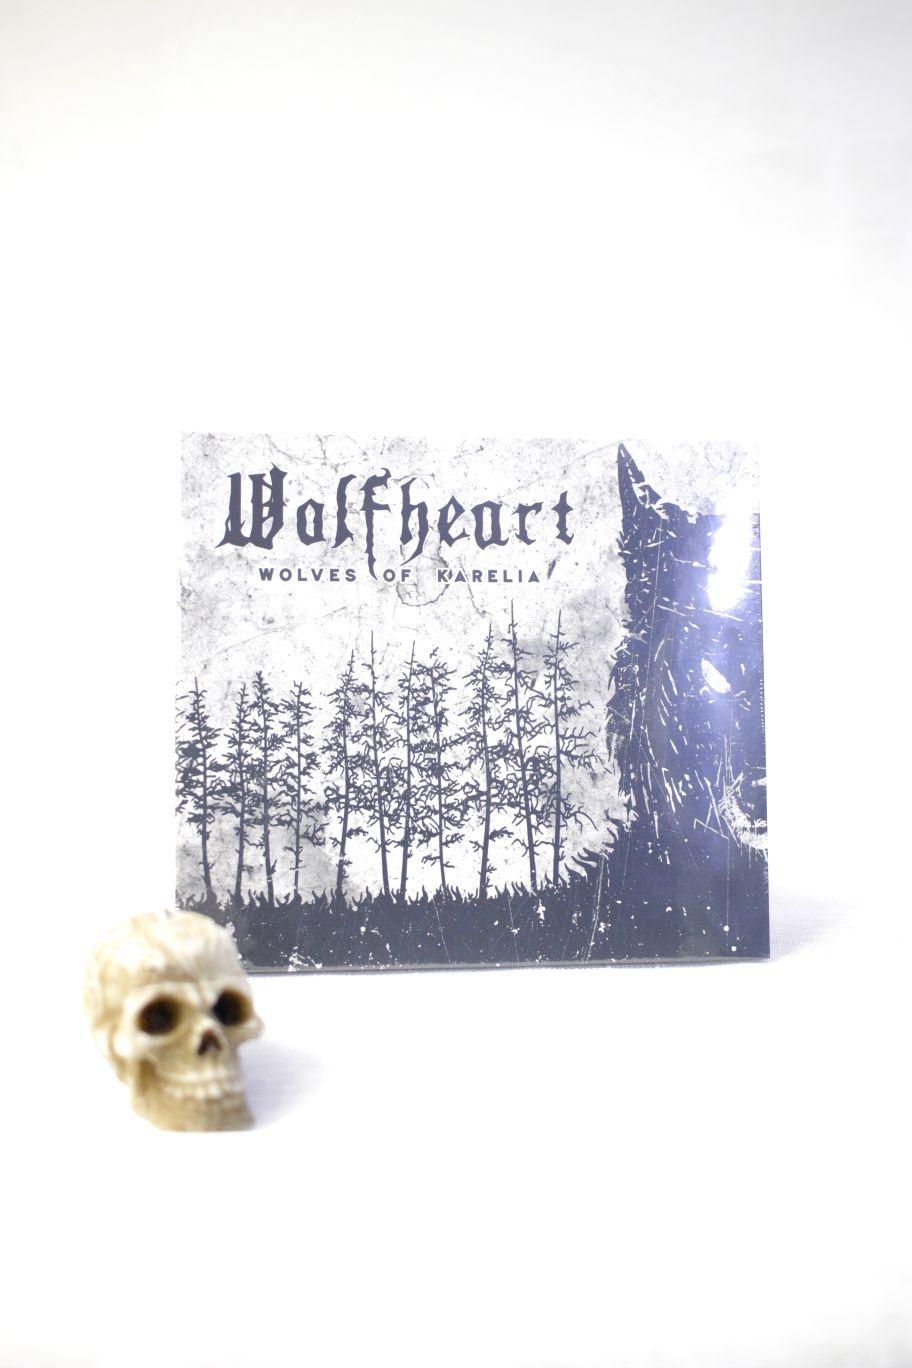 CD WOLFHEART WOLVES OF KARELIA